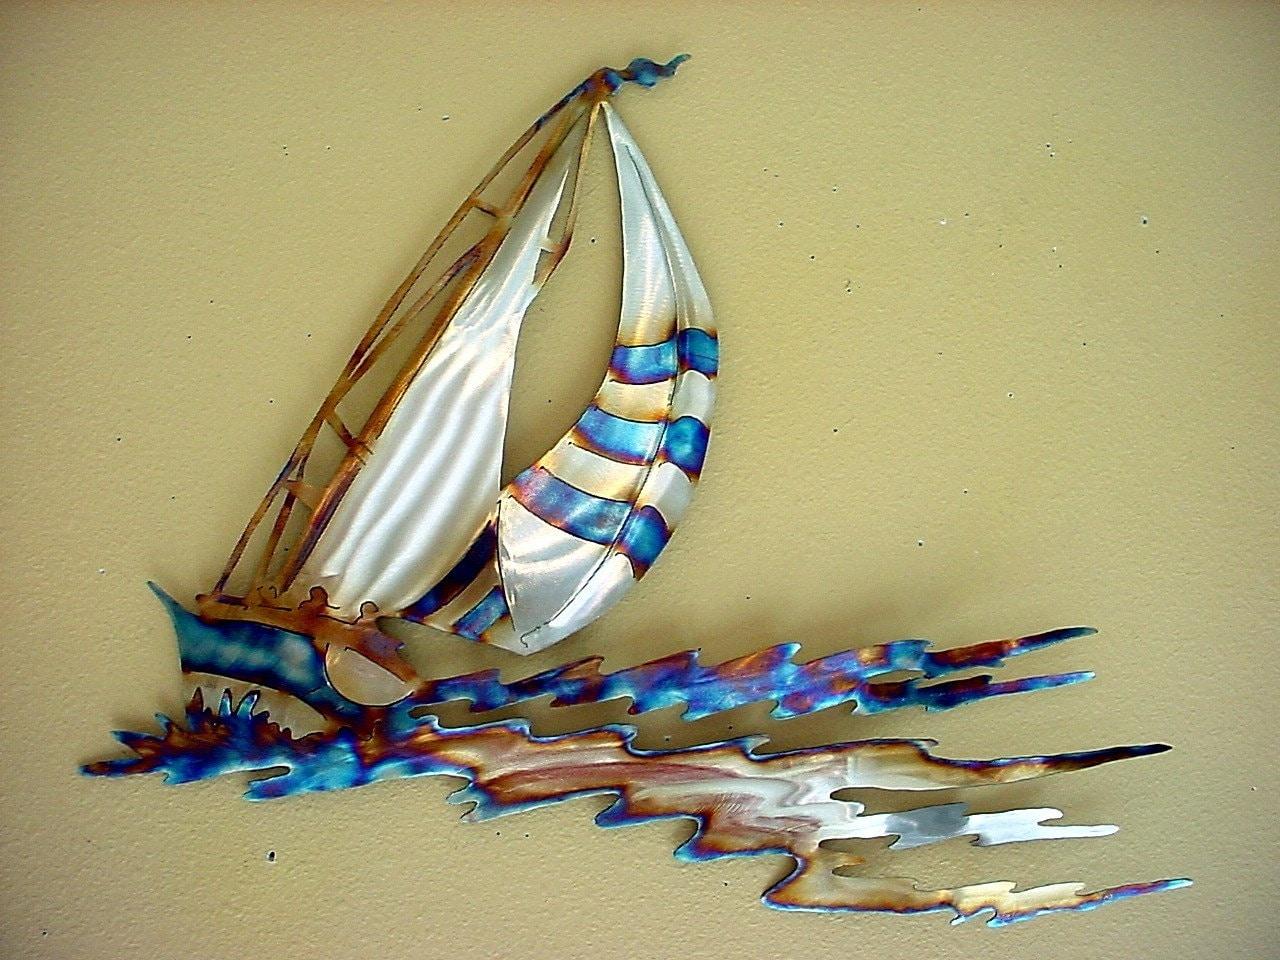 Sailboat sailor sailing stainless steel metal wall art open for Stainless steel wall art